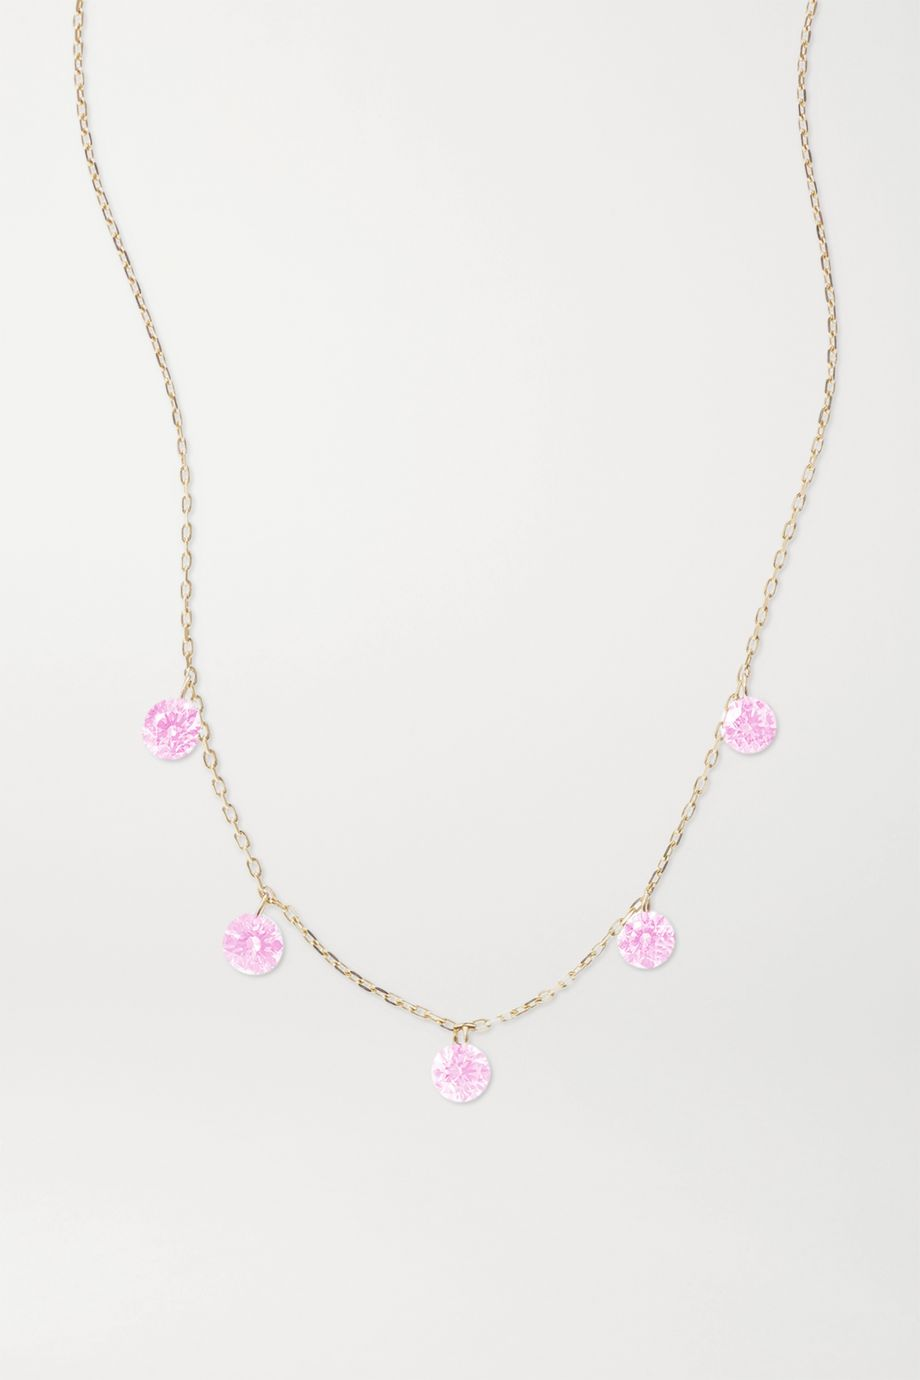 Persée La Vie en Rose 黄金蓝宝石项链